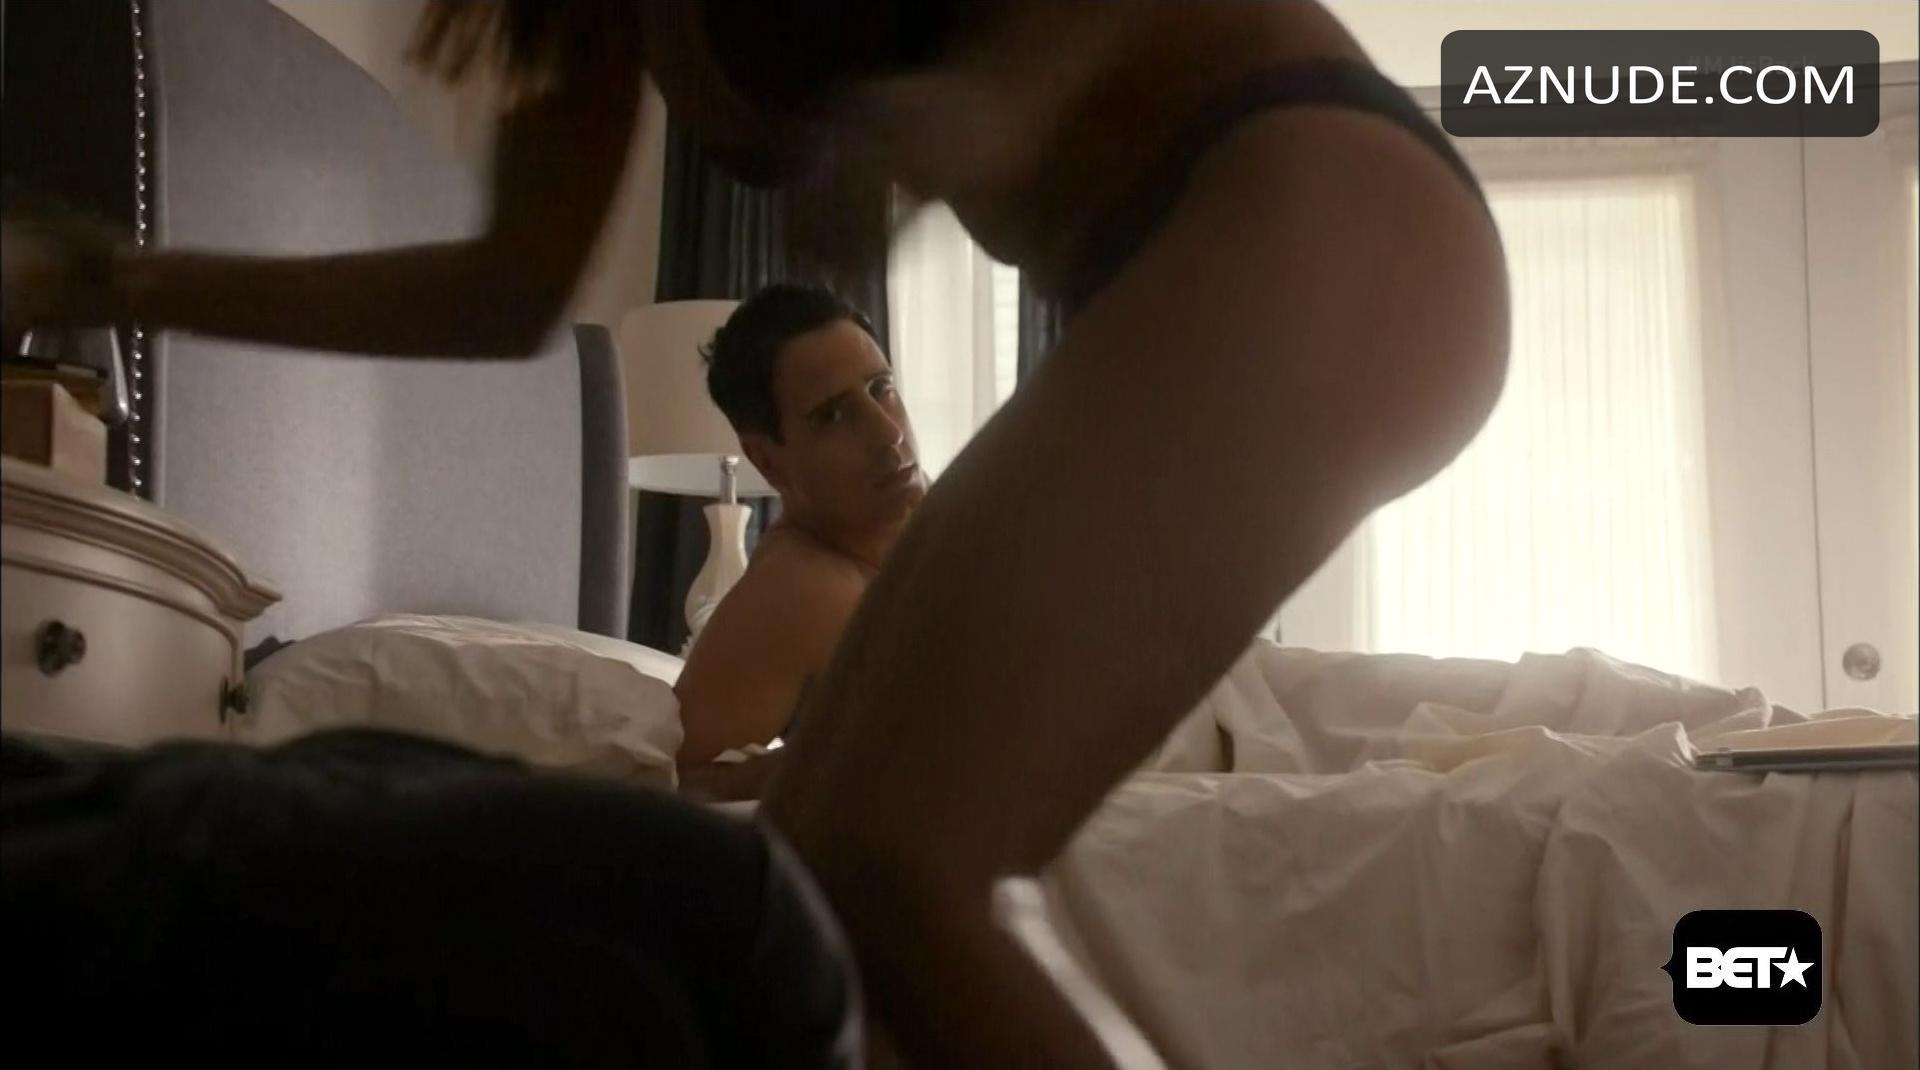 ashley fickes naked